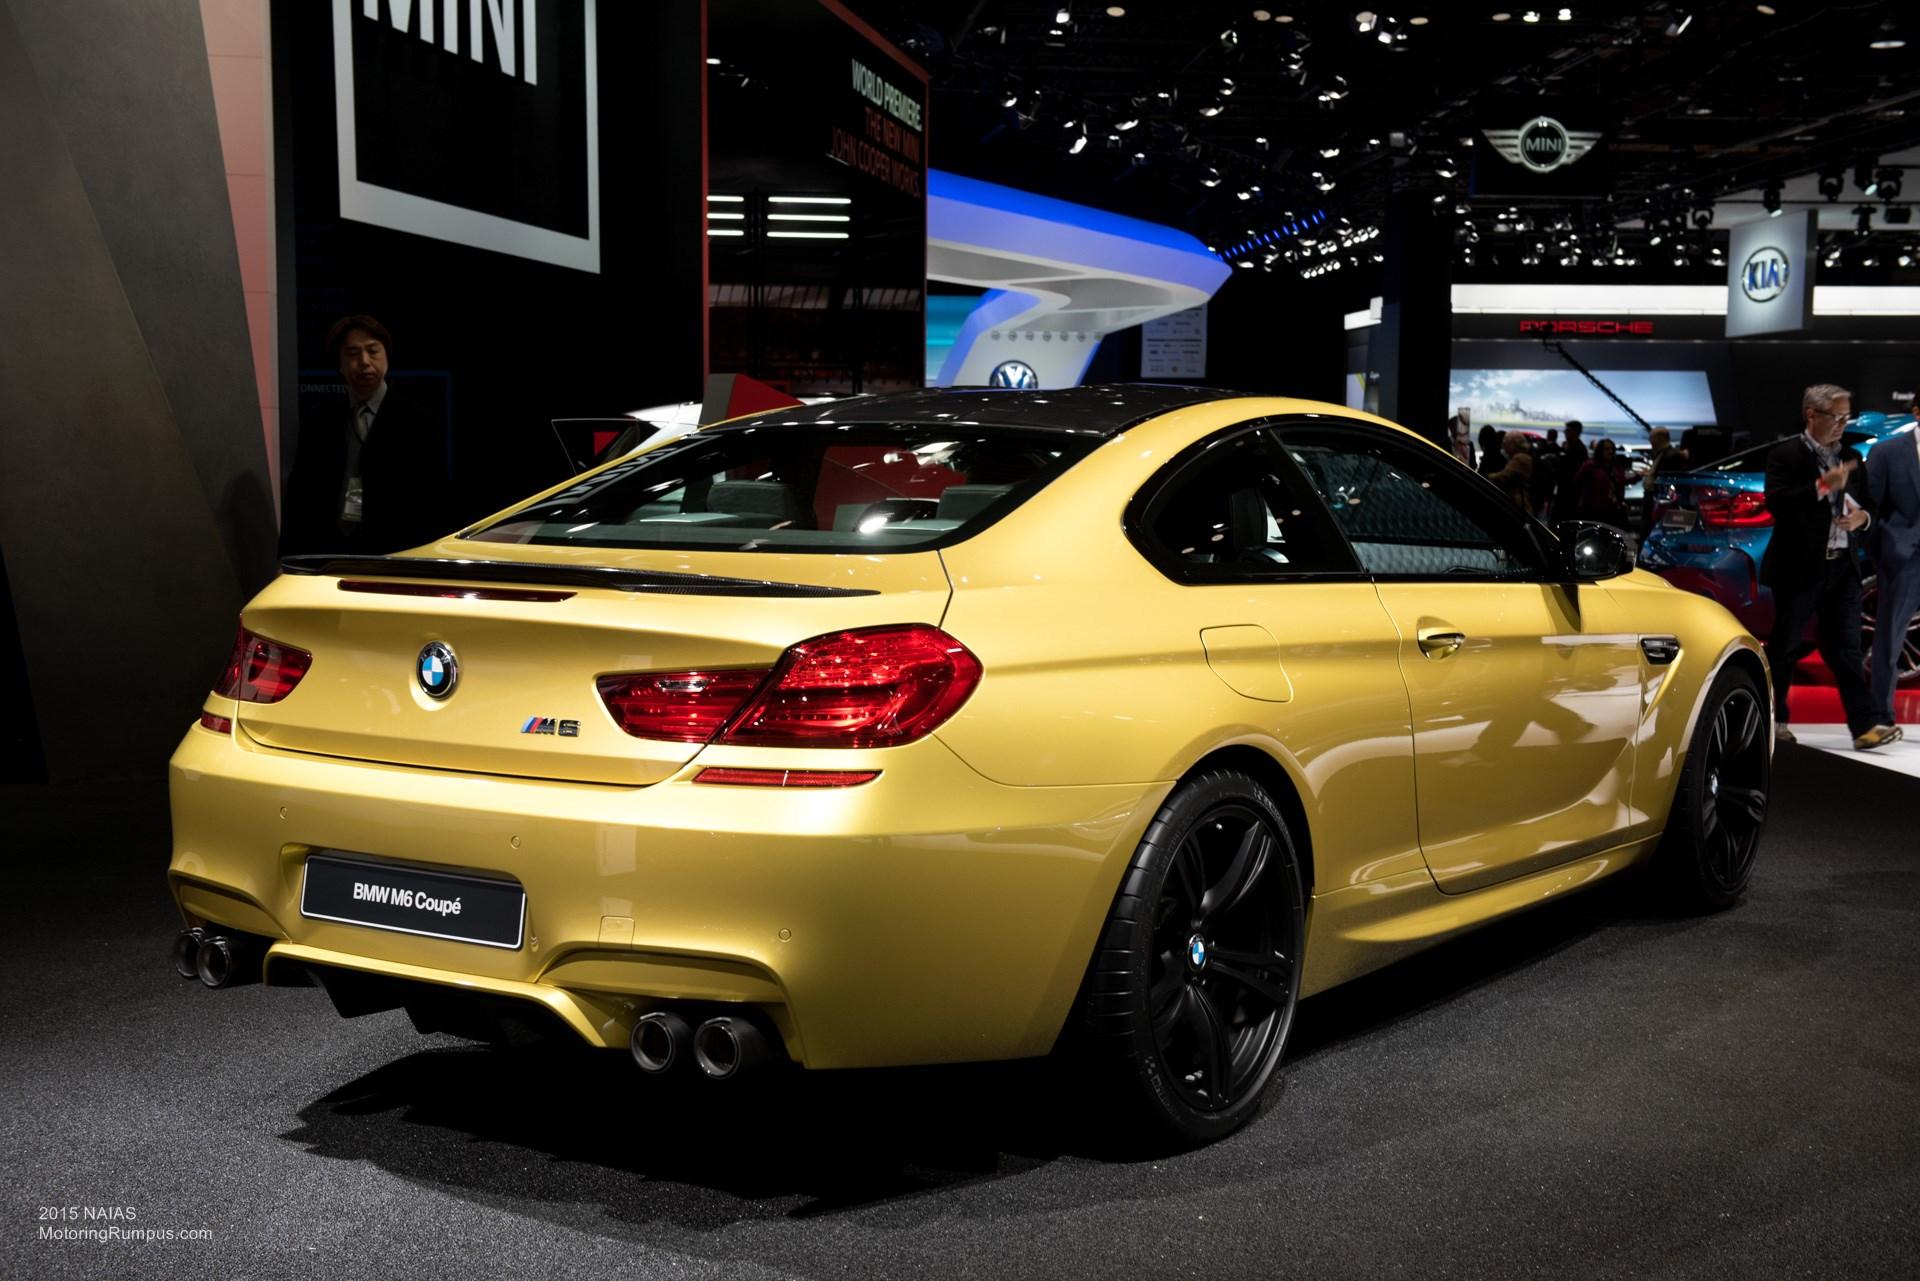 2015 NAIAS BMW M6 Rear